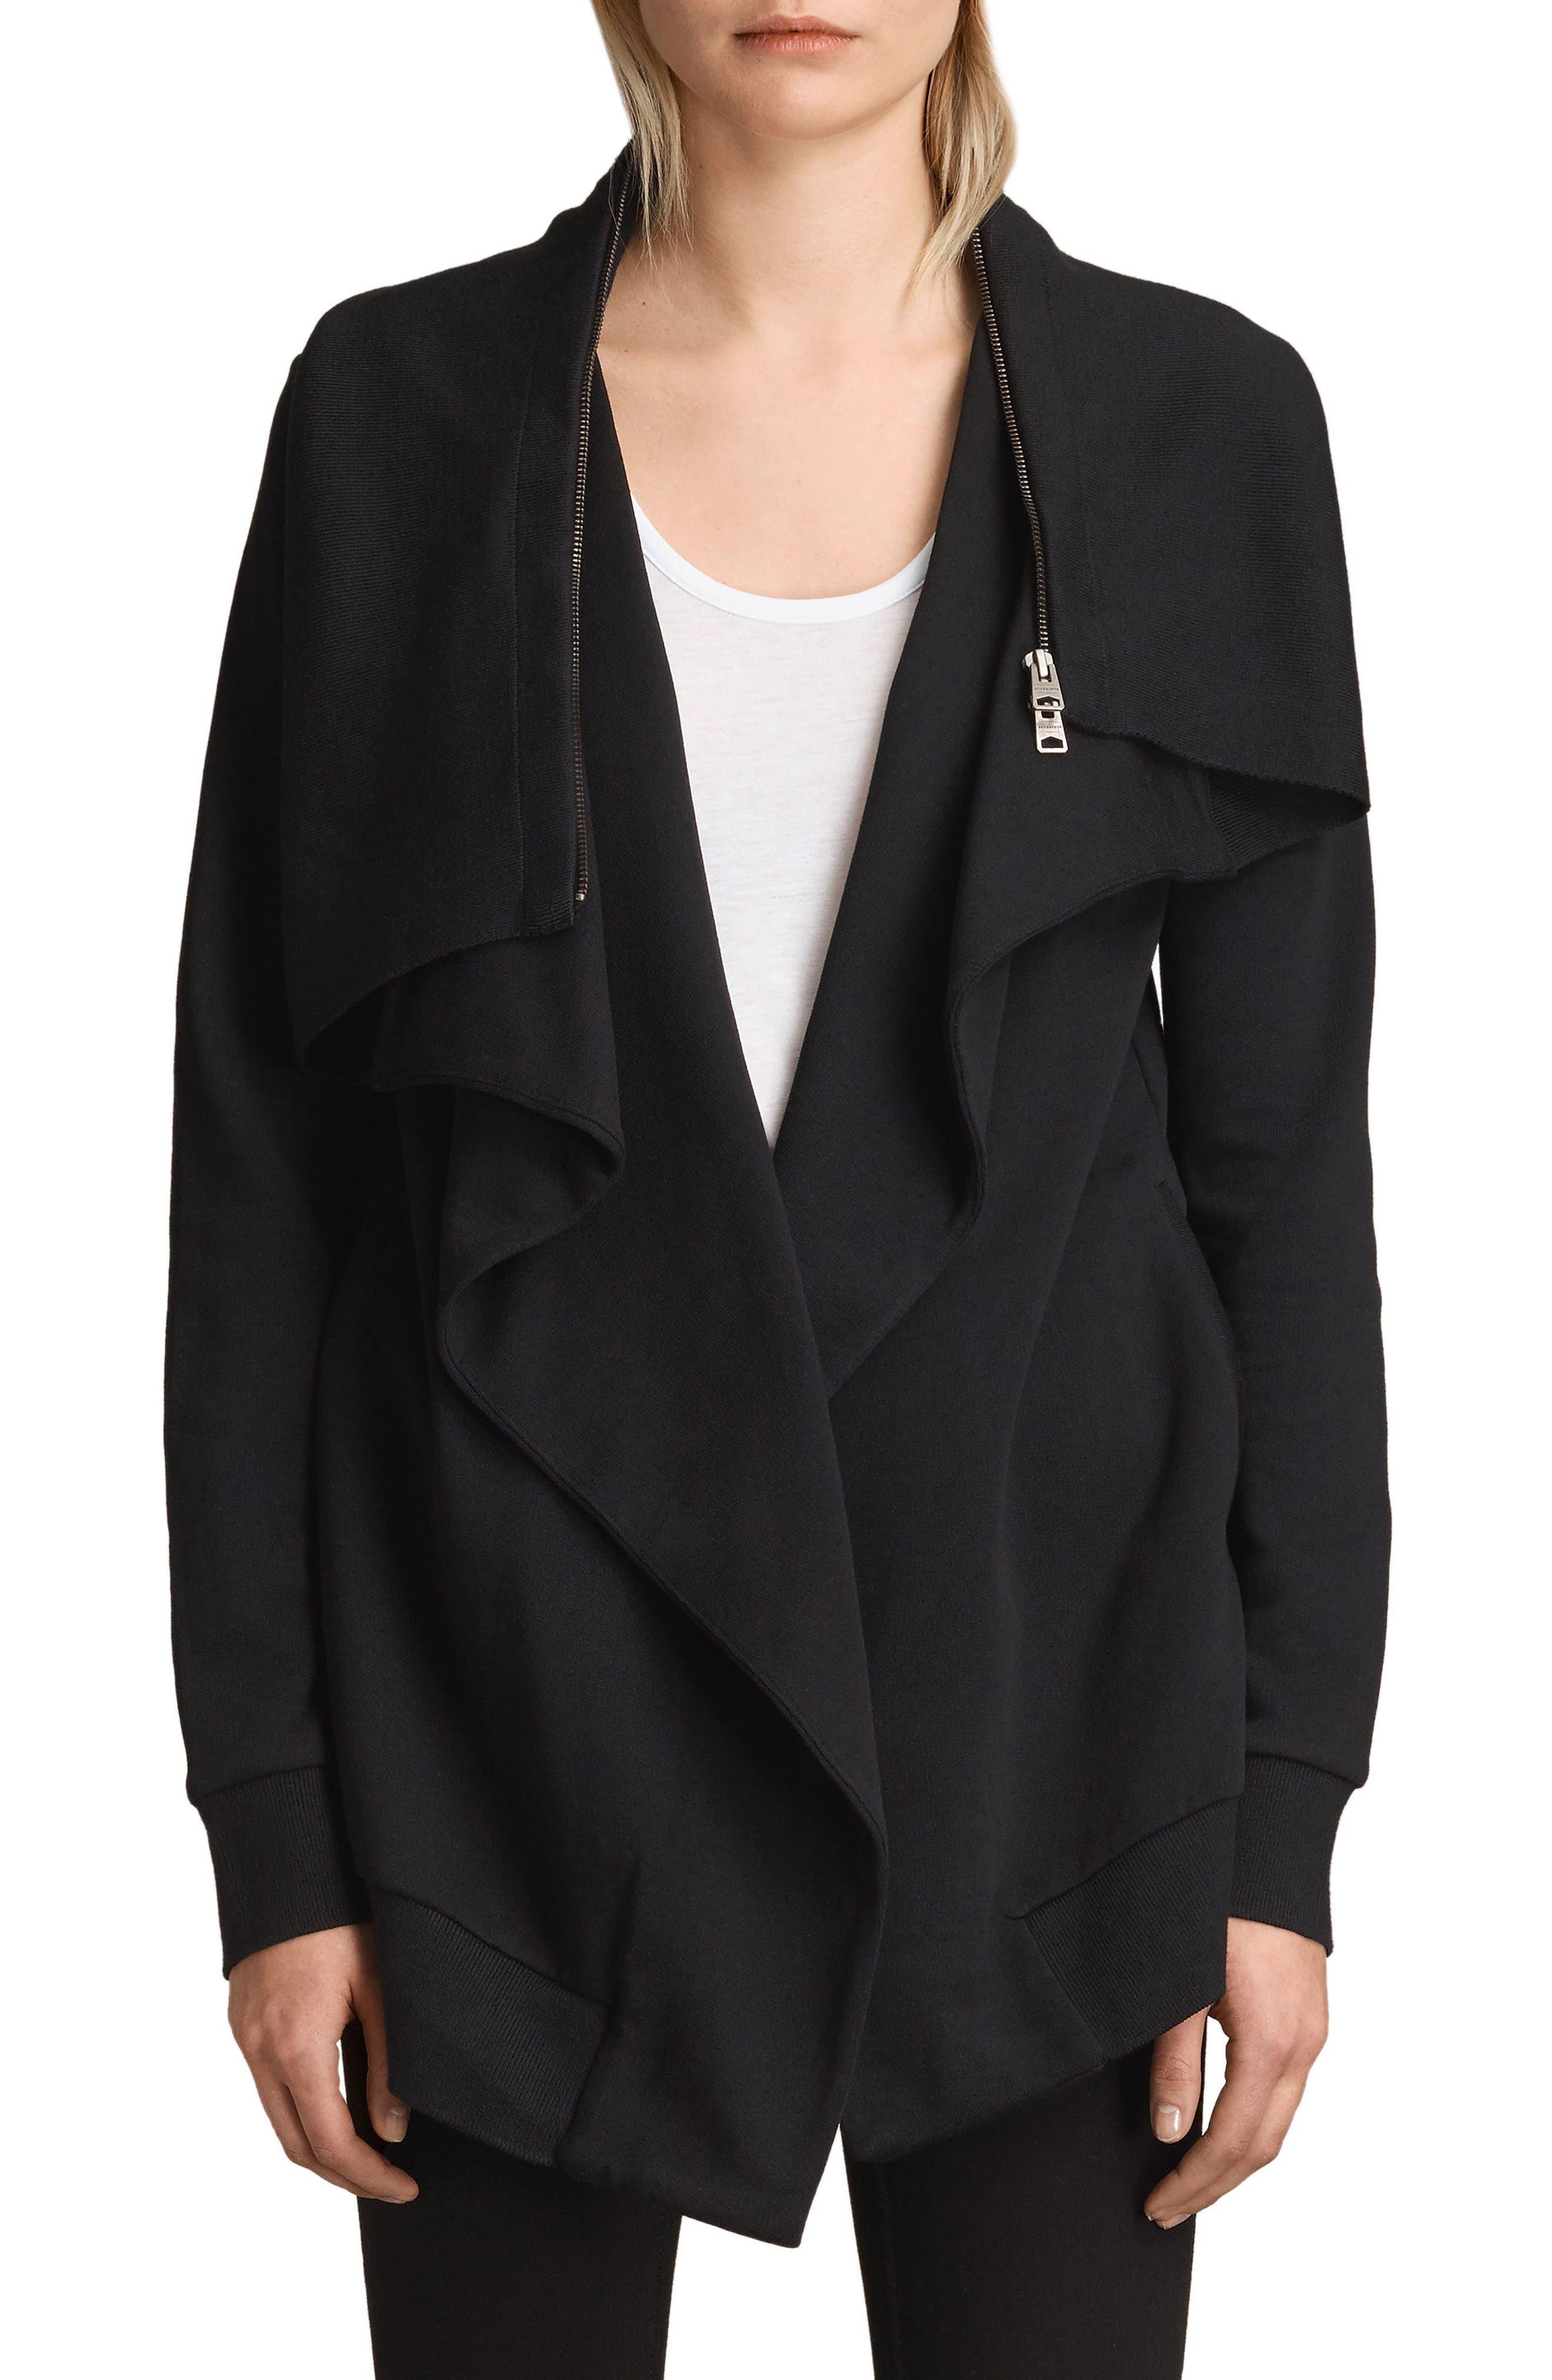 ALLSAINTS, Dahlia Sweatshirt, Main thumbnail 1, color, BLACK